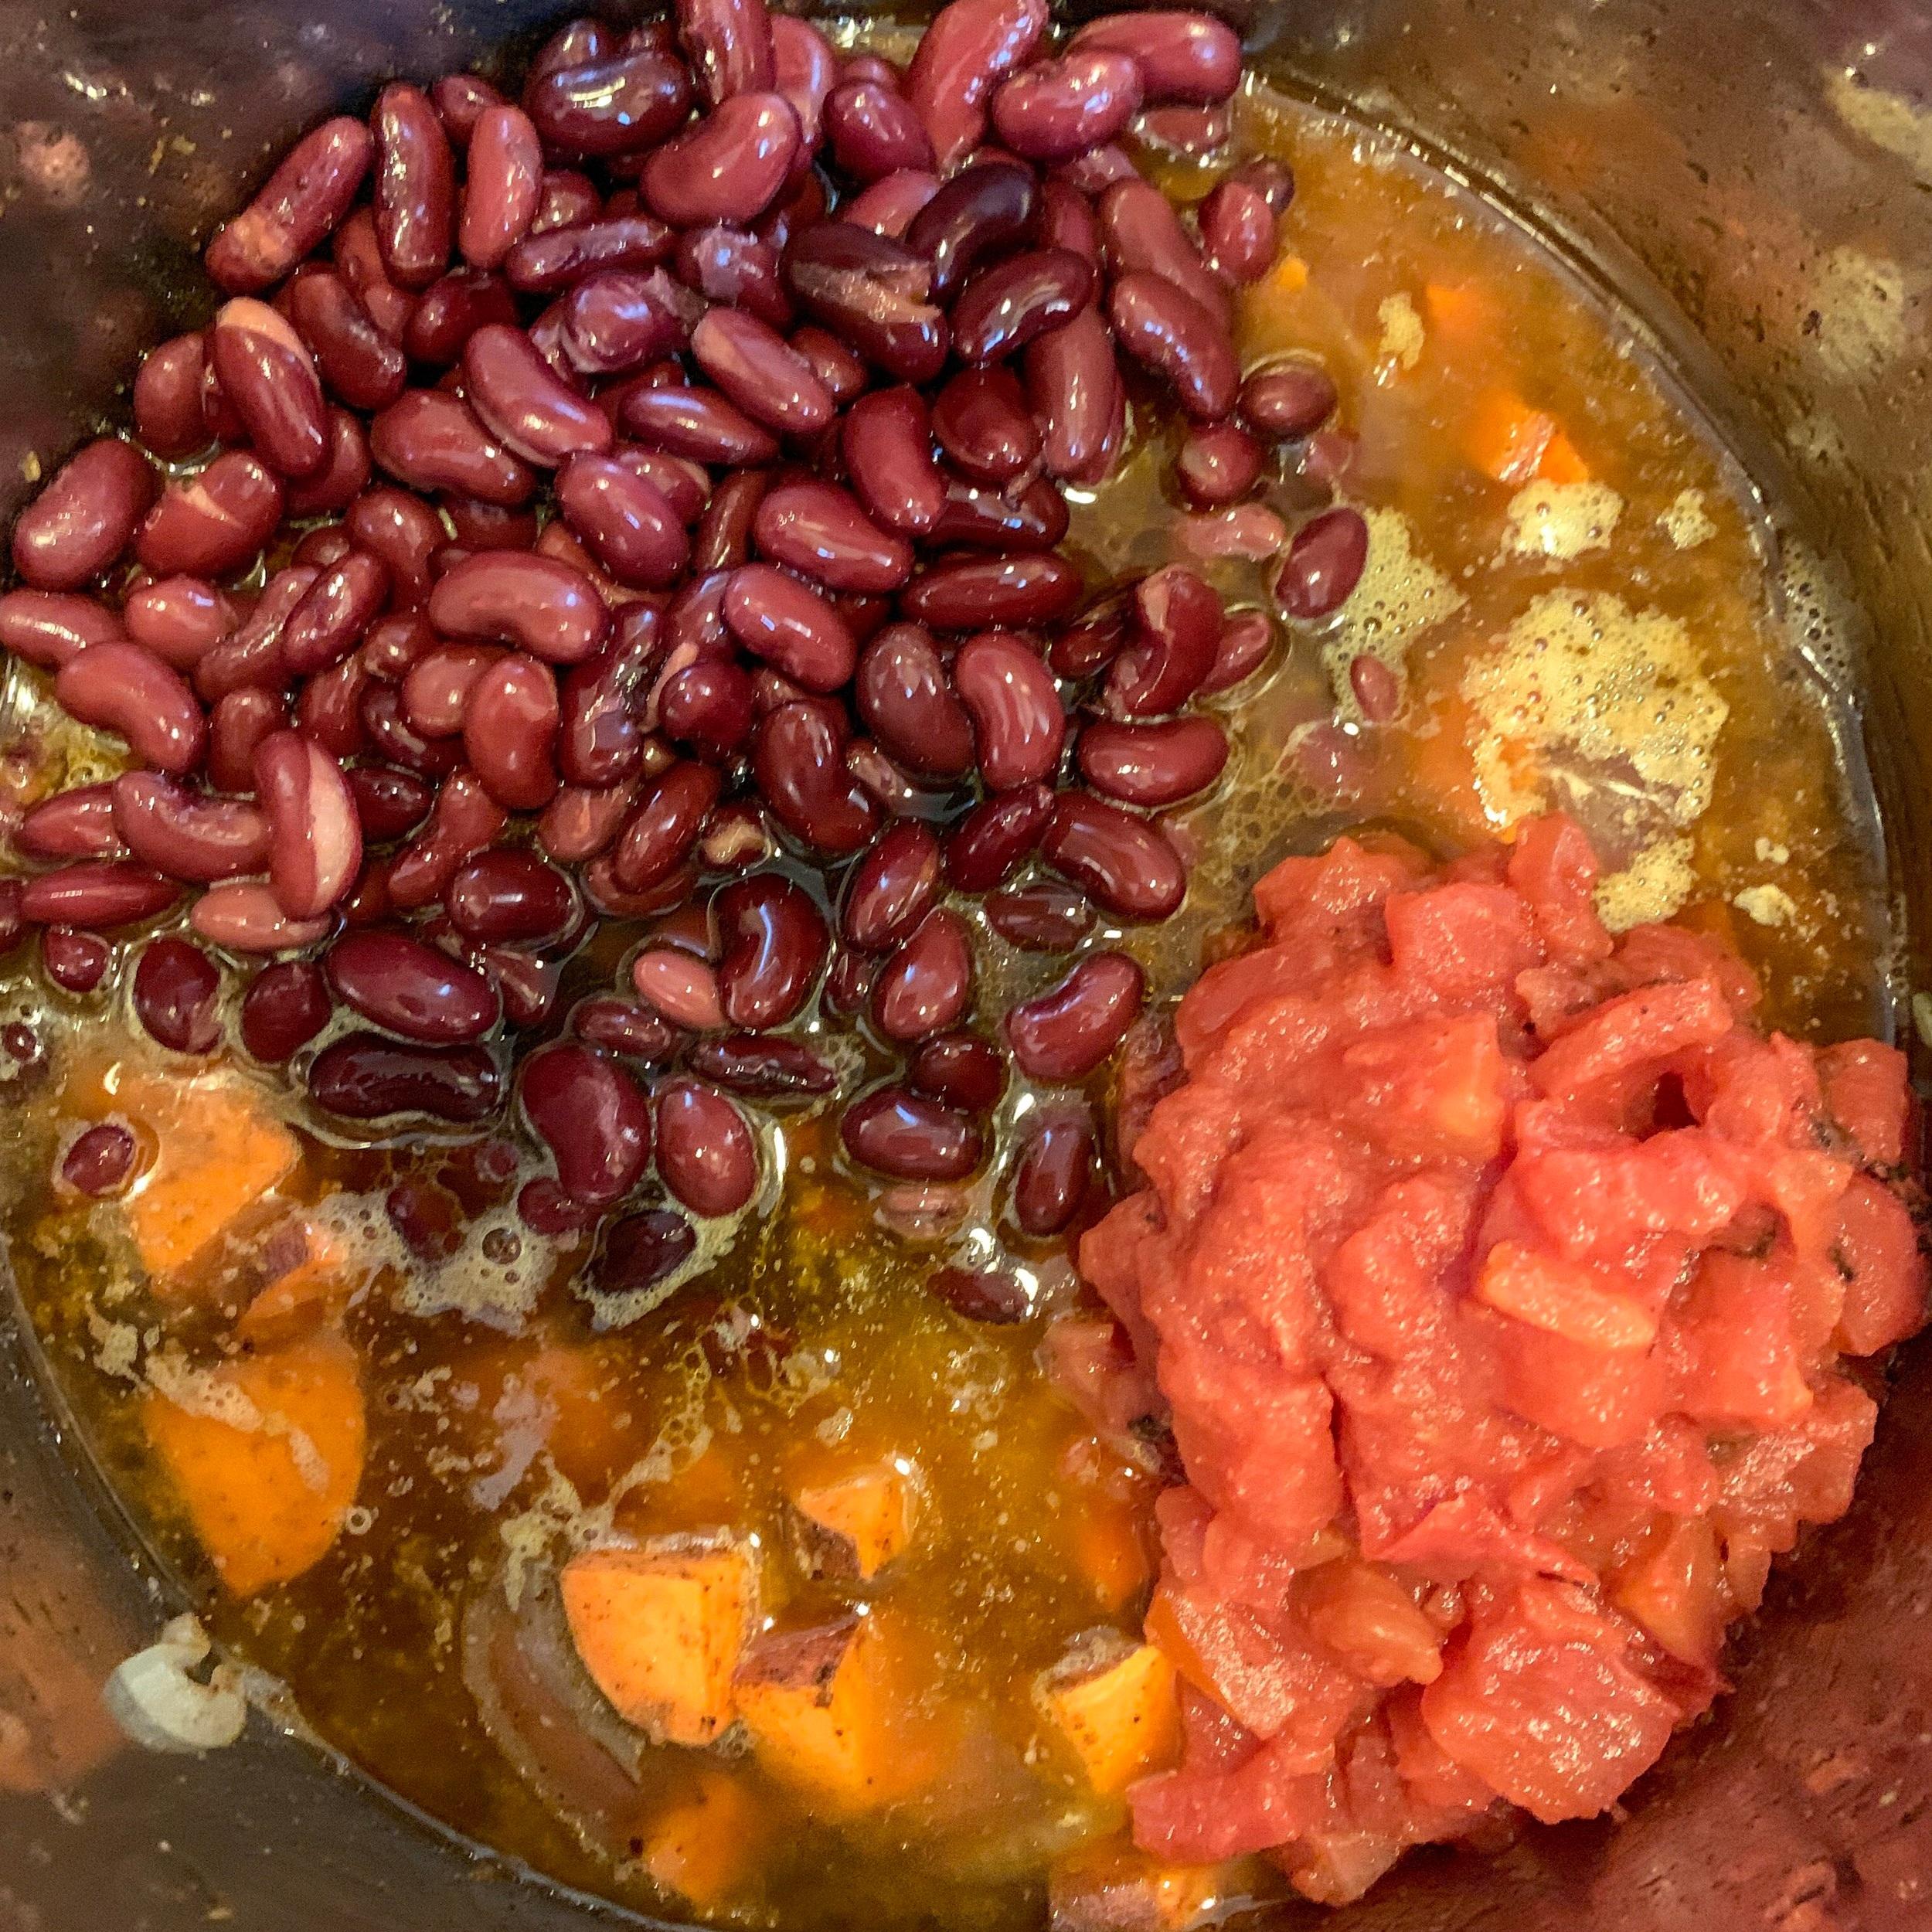 instant pot recipe instructions maple bourbon chili